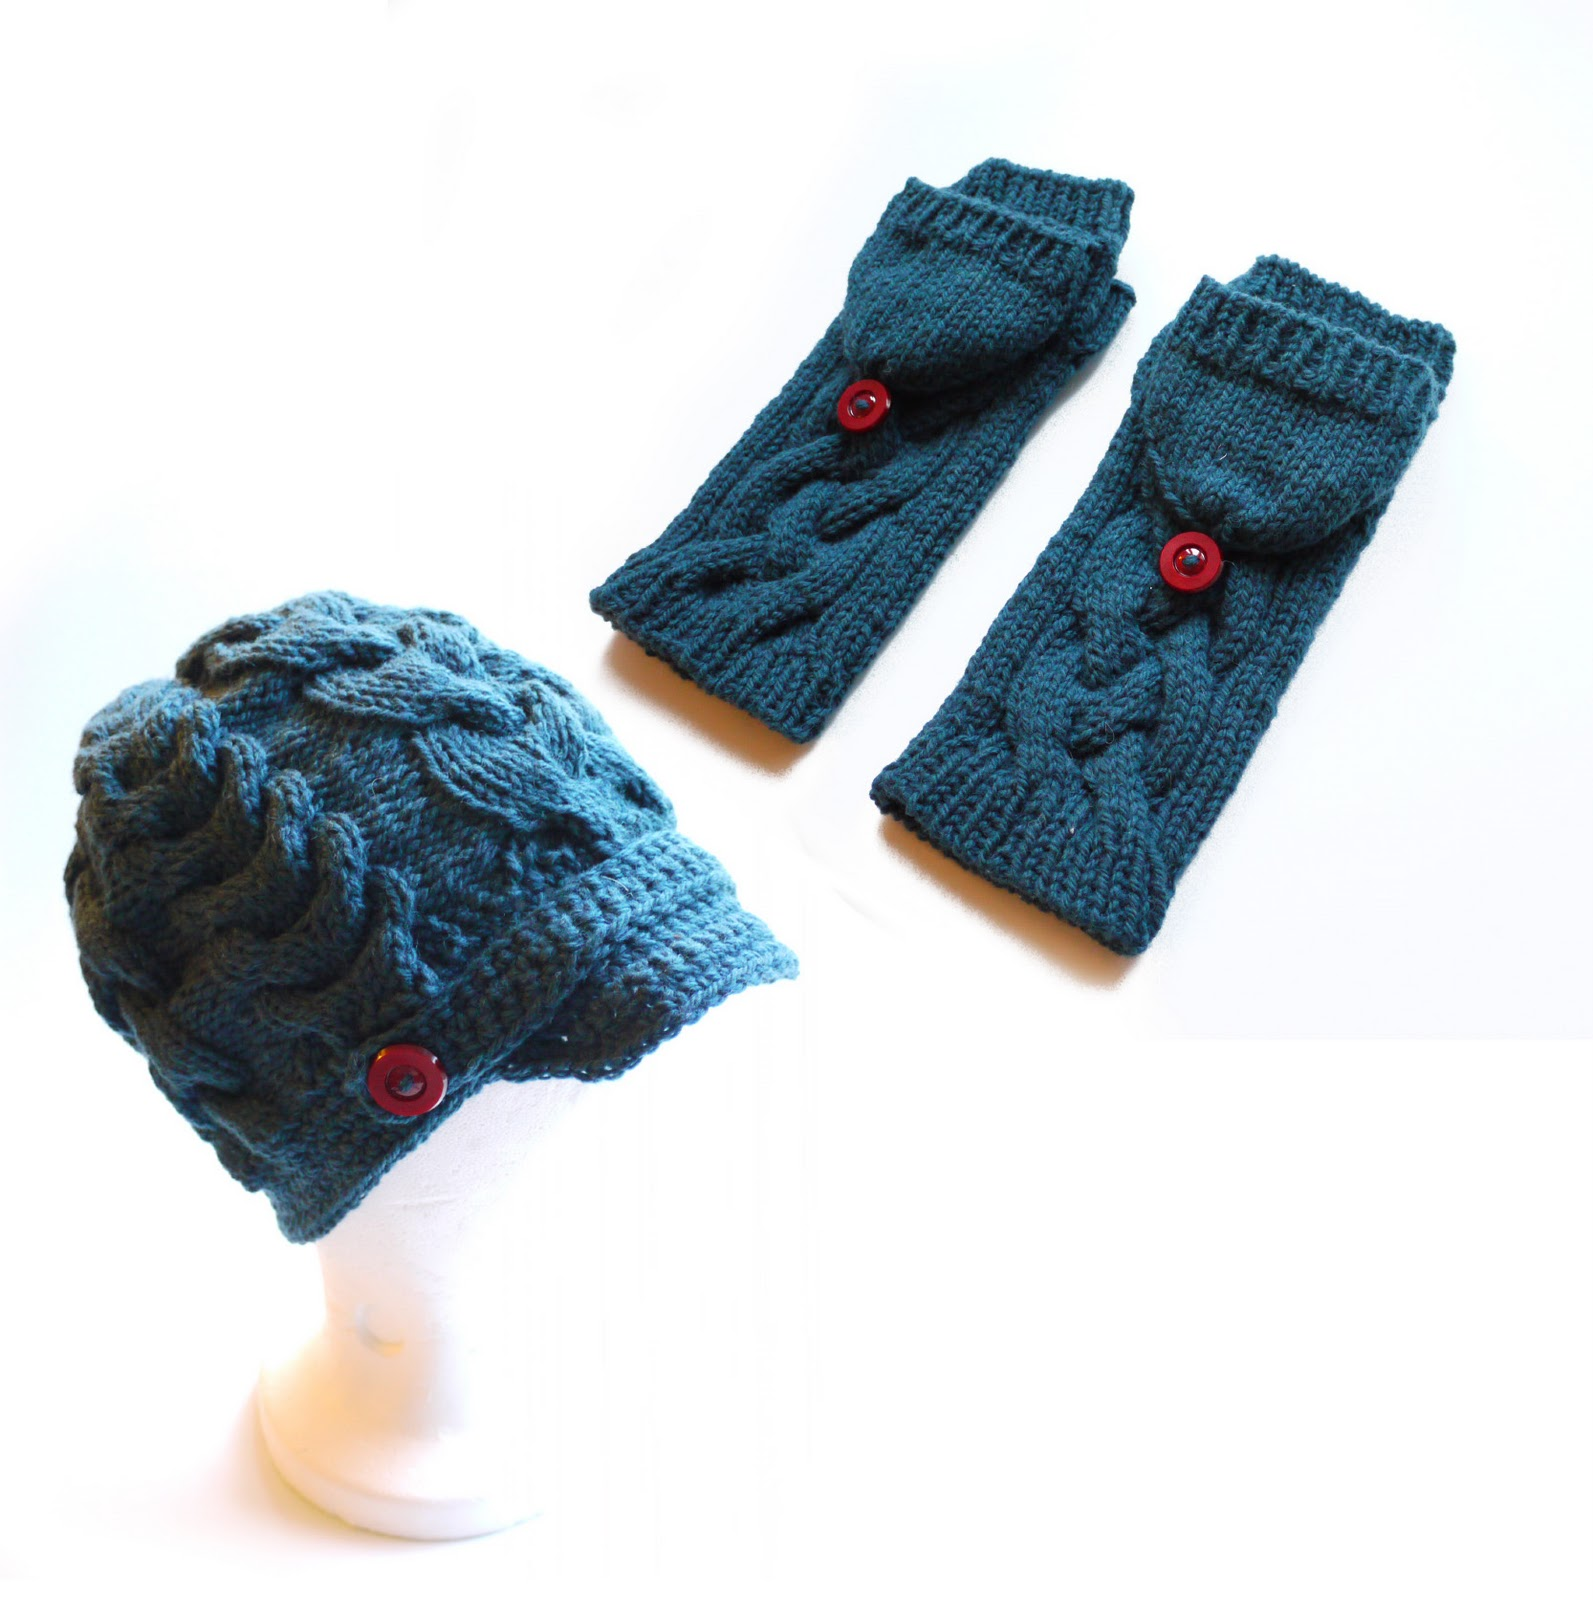 Crochet Pattern Central Fingerless Gloves : Crochet Pattern ? Convertible Mittens Free Patterns For ...